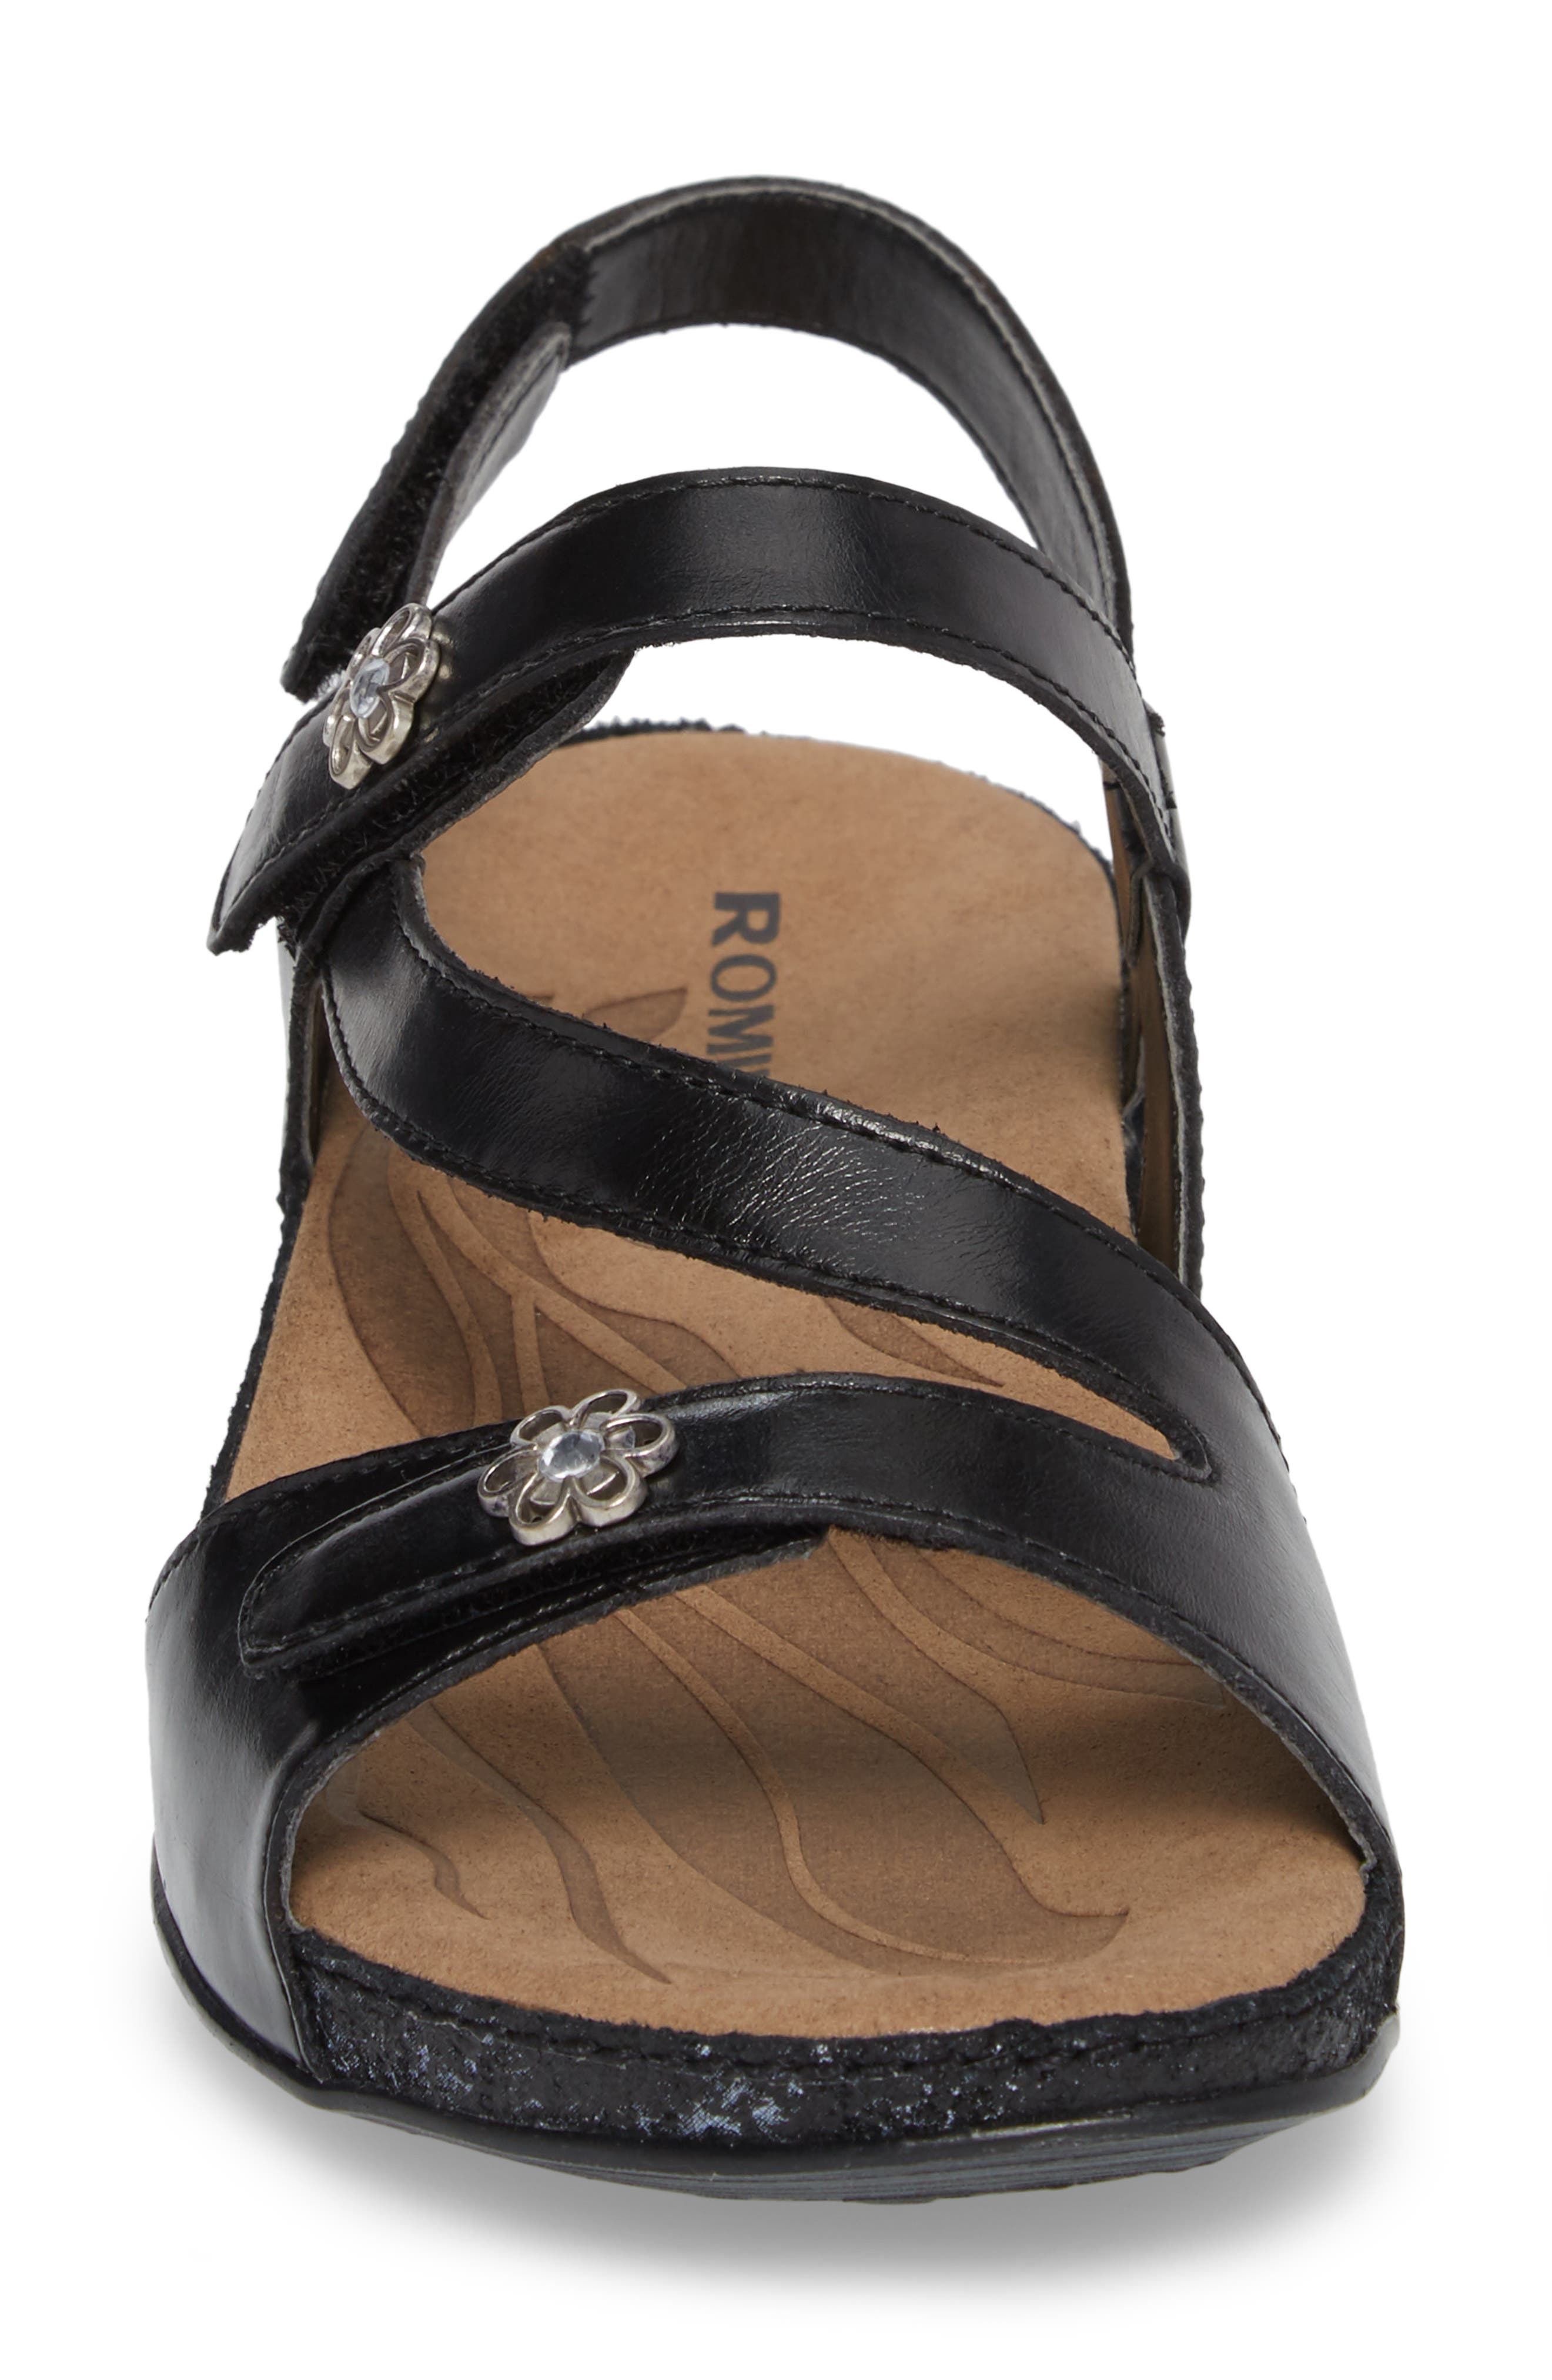 ROMIKA<SUP>®</SUP>, Fidschi 54 Sandal, Alternate thumbnail 4, color, BLACK LEATHER